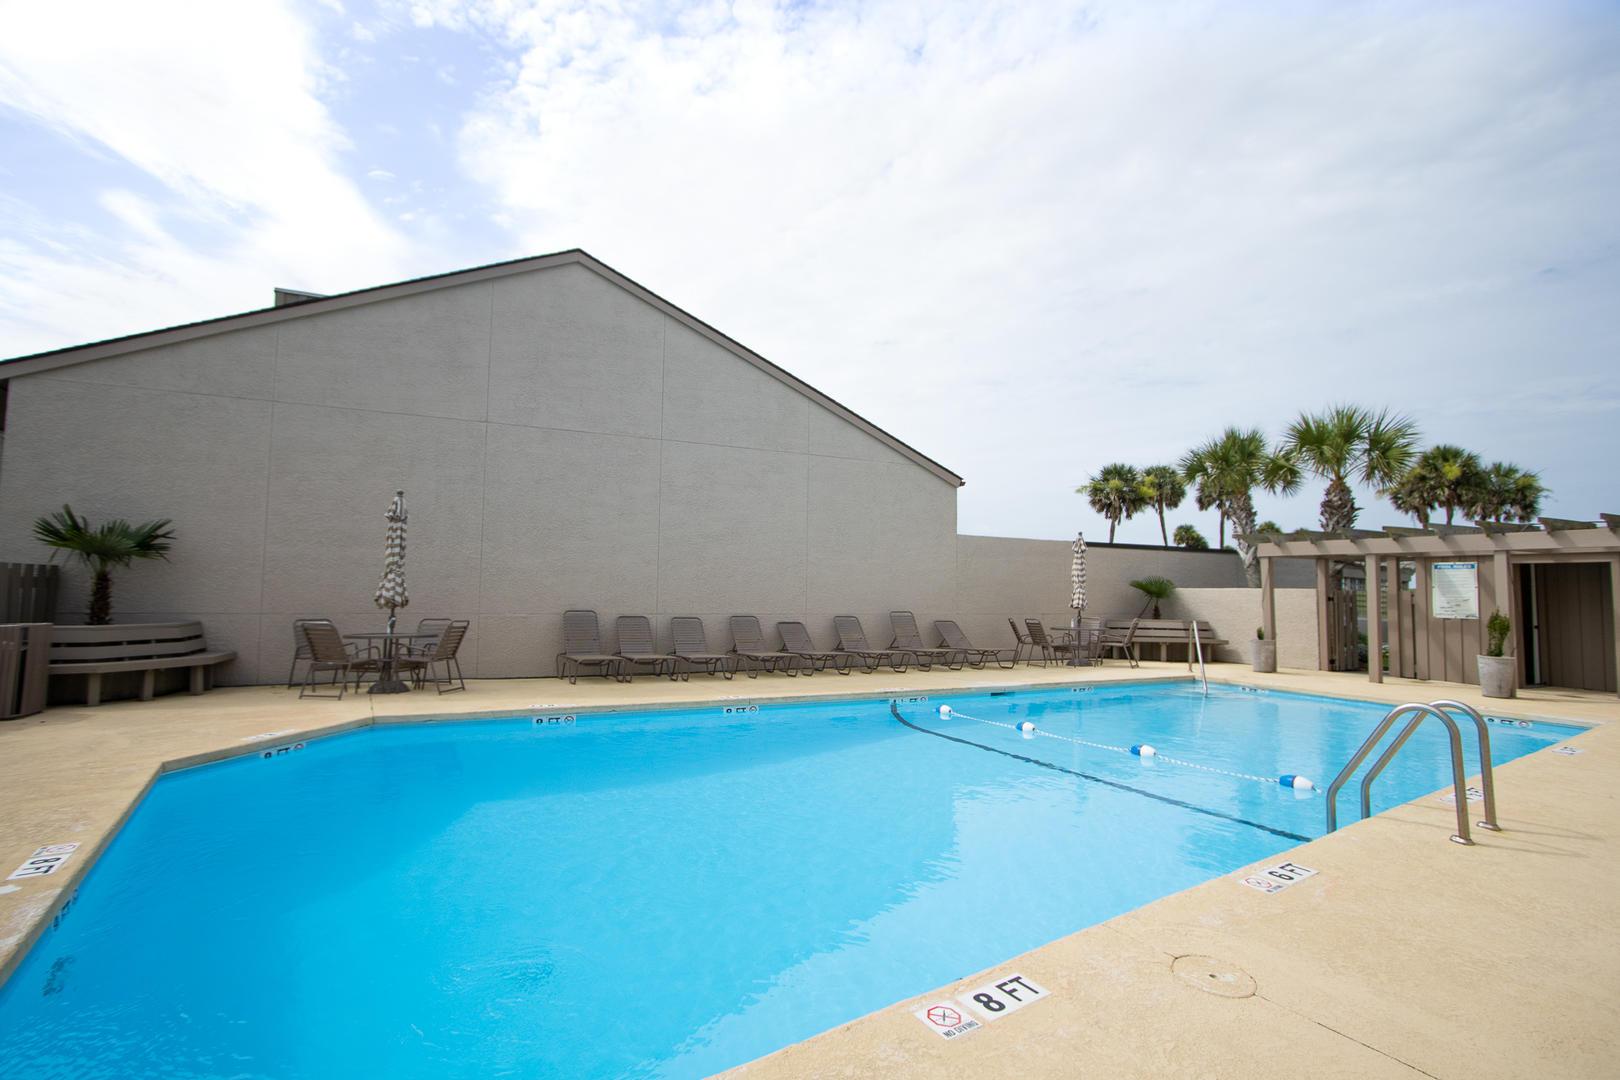 Sanddown Neighborhood Pool